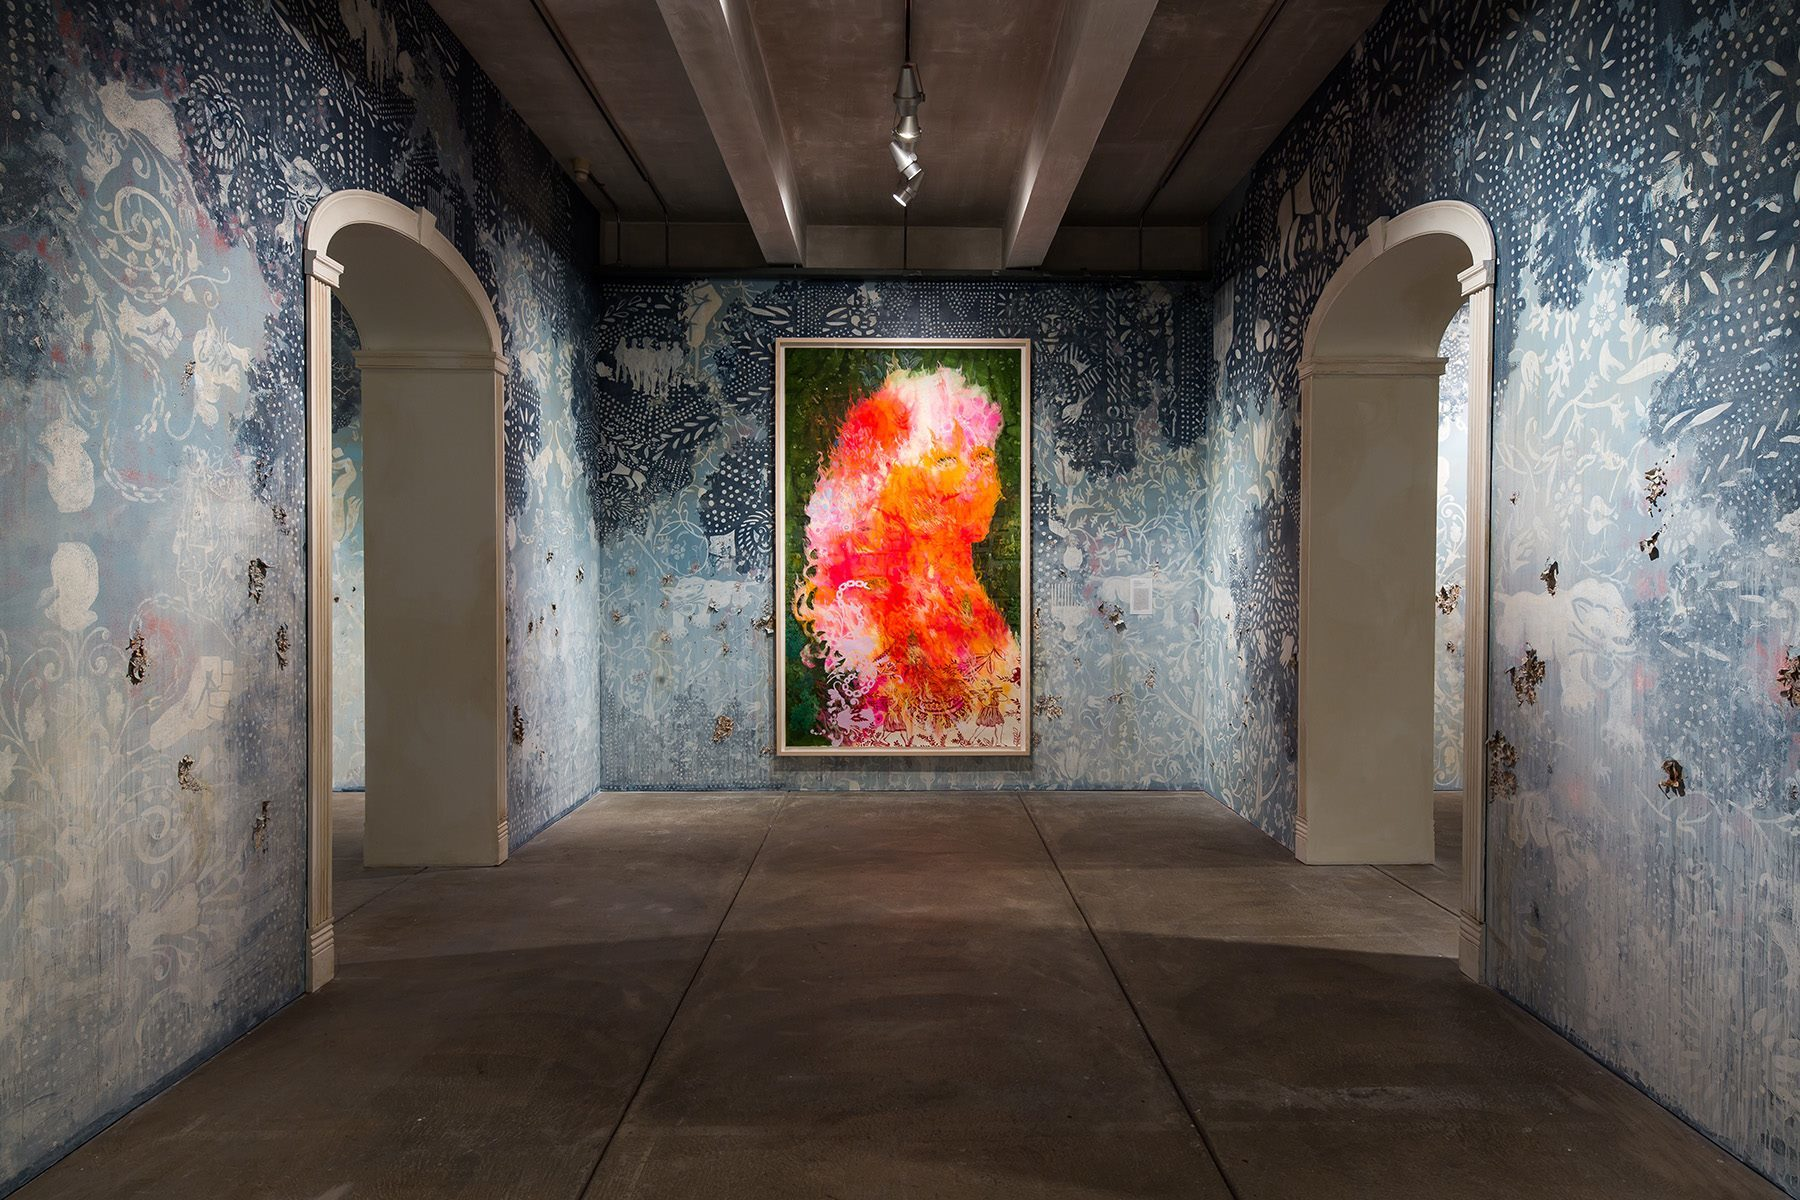 Andy-Warhol-Firelei-Baez-Blood-Lines_Credit-Andy-Warhol-Museum.jpg?mtime=20180409093251#asset:101346